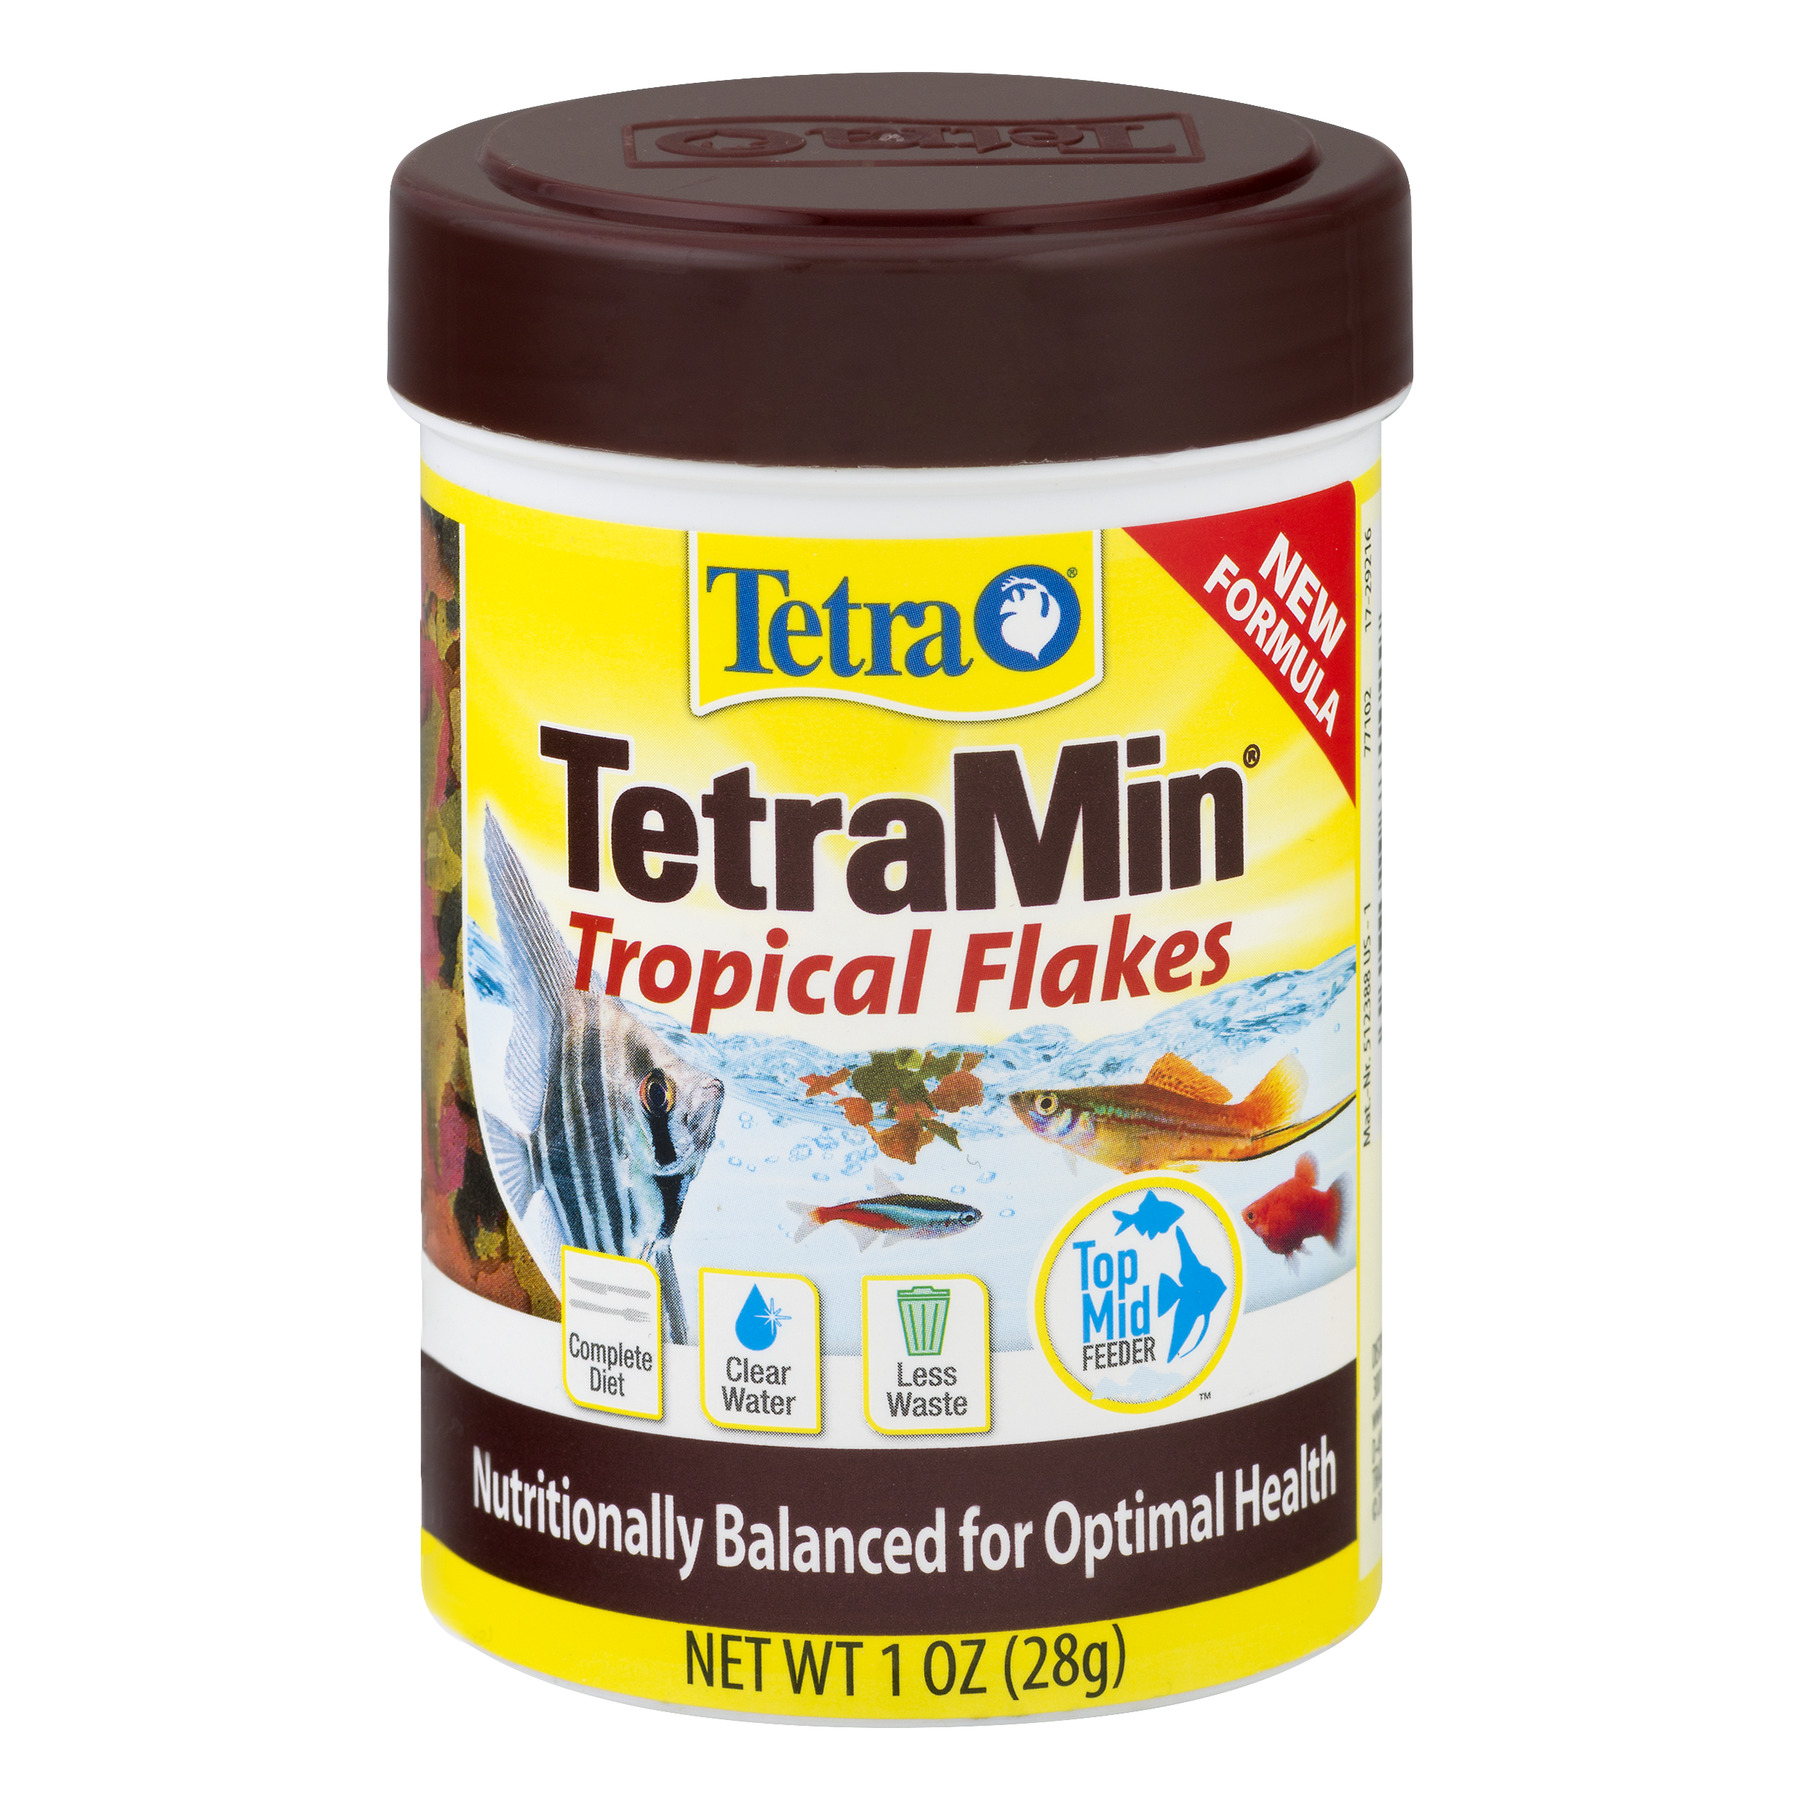 Tetra TetraMin Balanced Diet Tropical Flakes, Tropical Fish Food- 1.0 oz